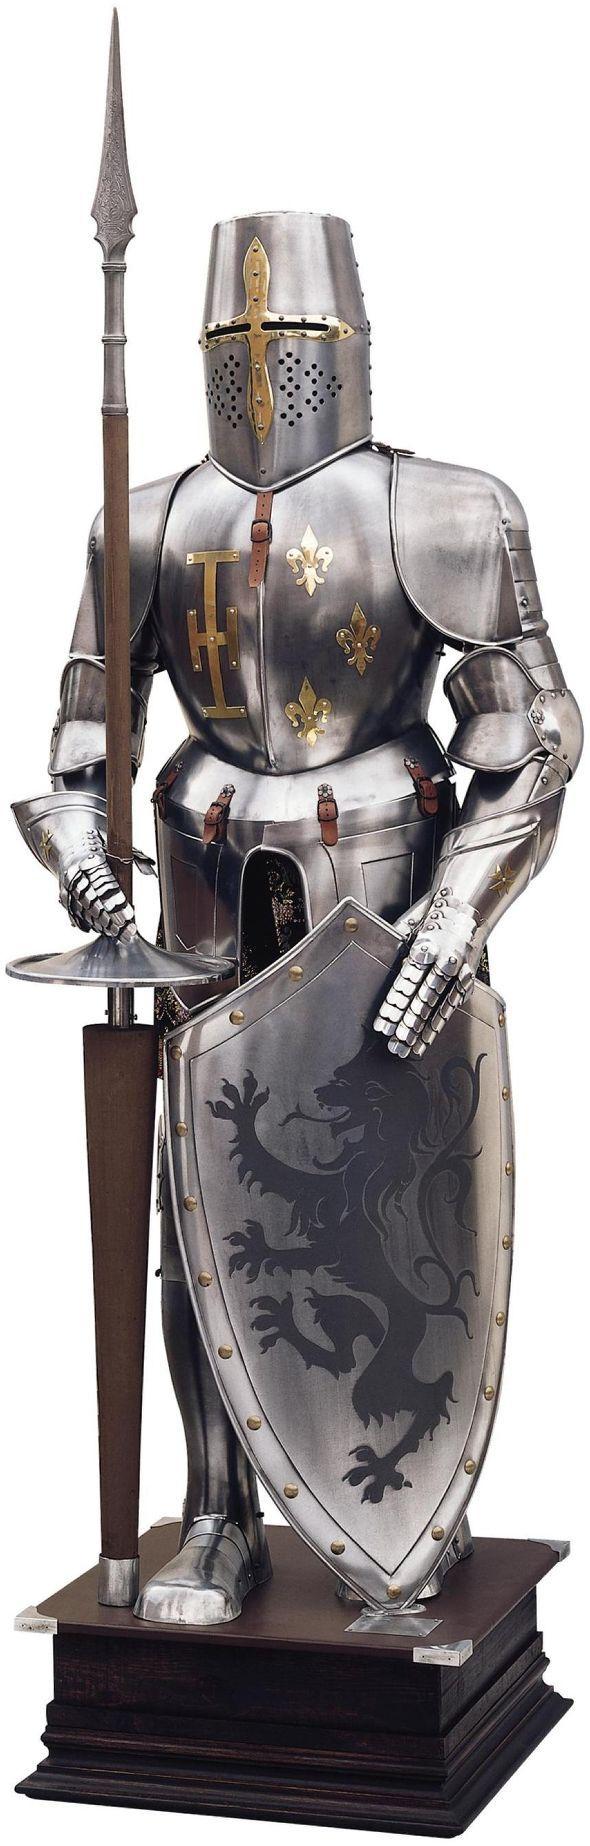 toledo swords medieval suit of armor fine quality medieval suit of